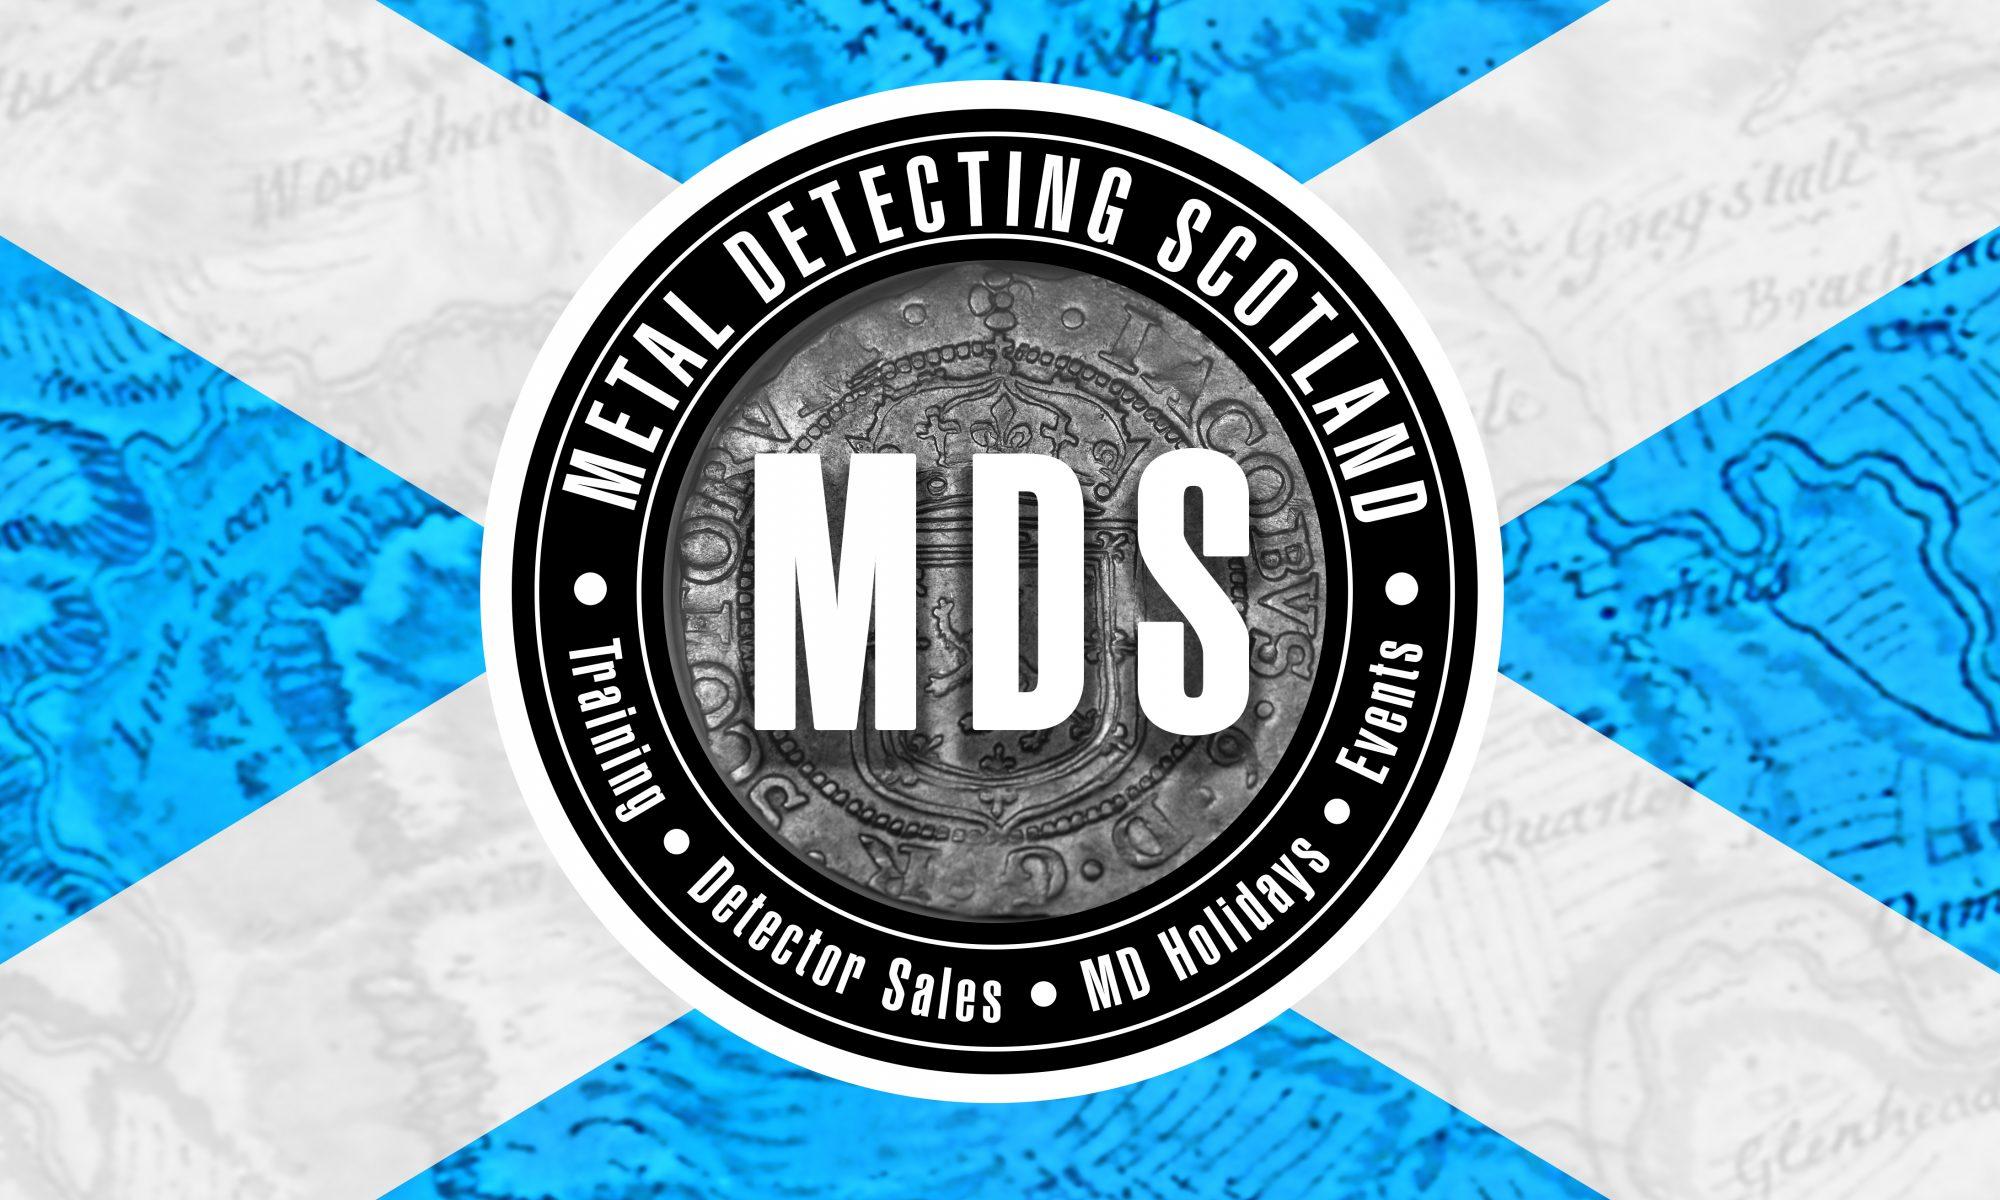 Metal Detecting In Scotland